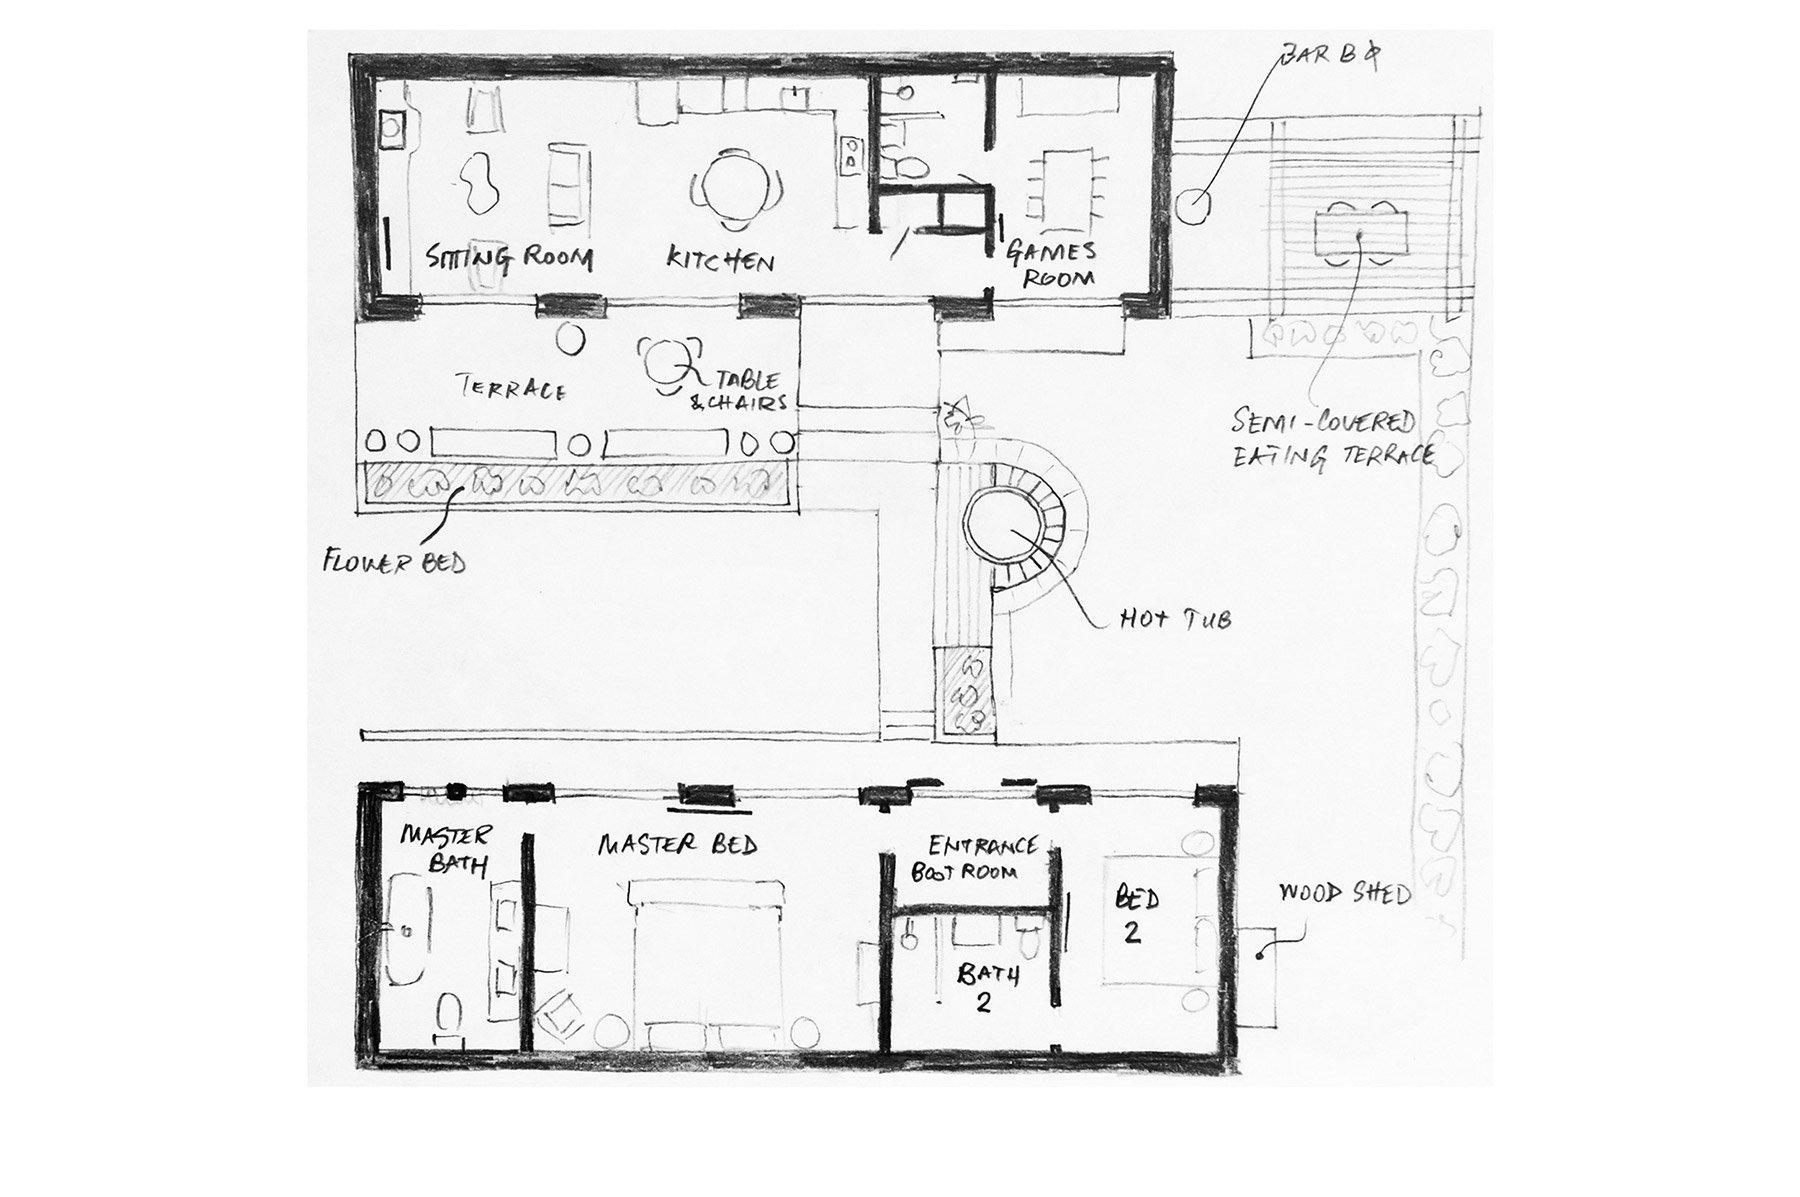 View the floorplan of Congrove Barns Bath